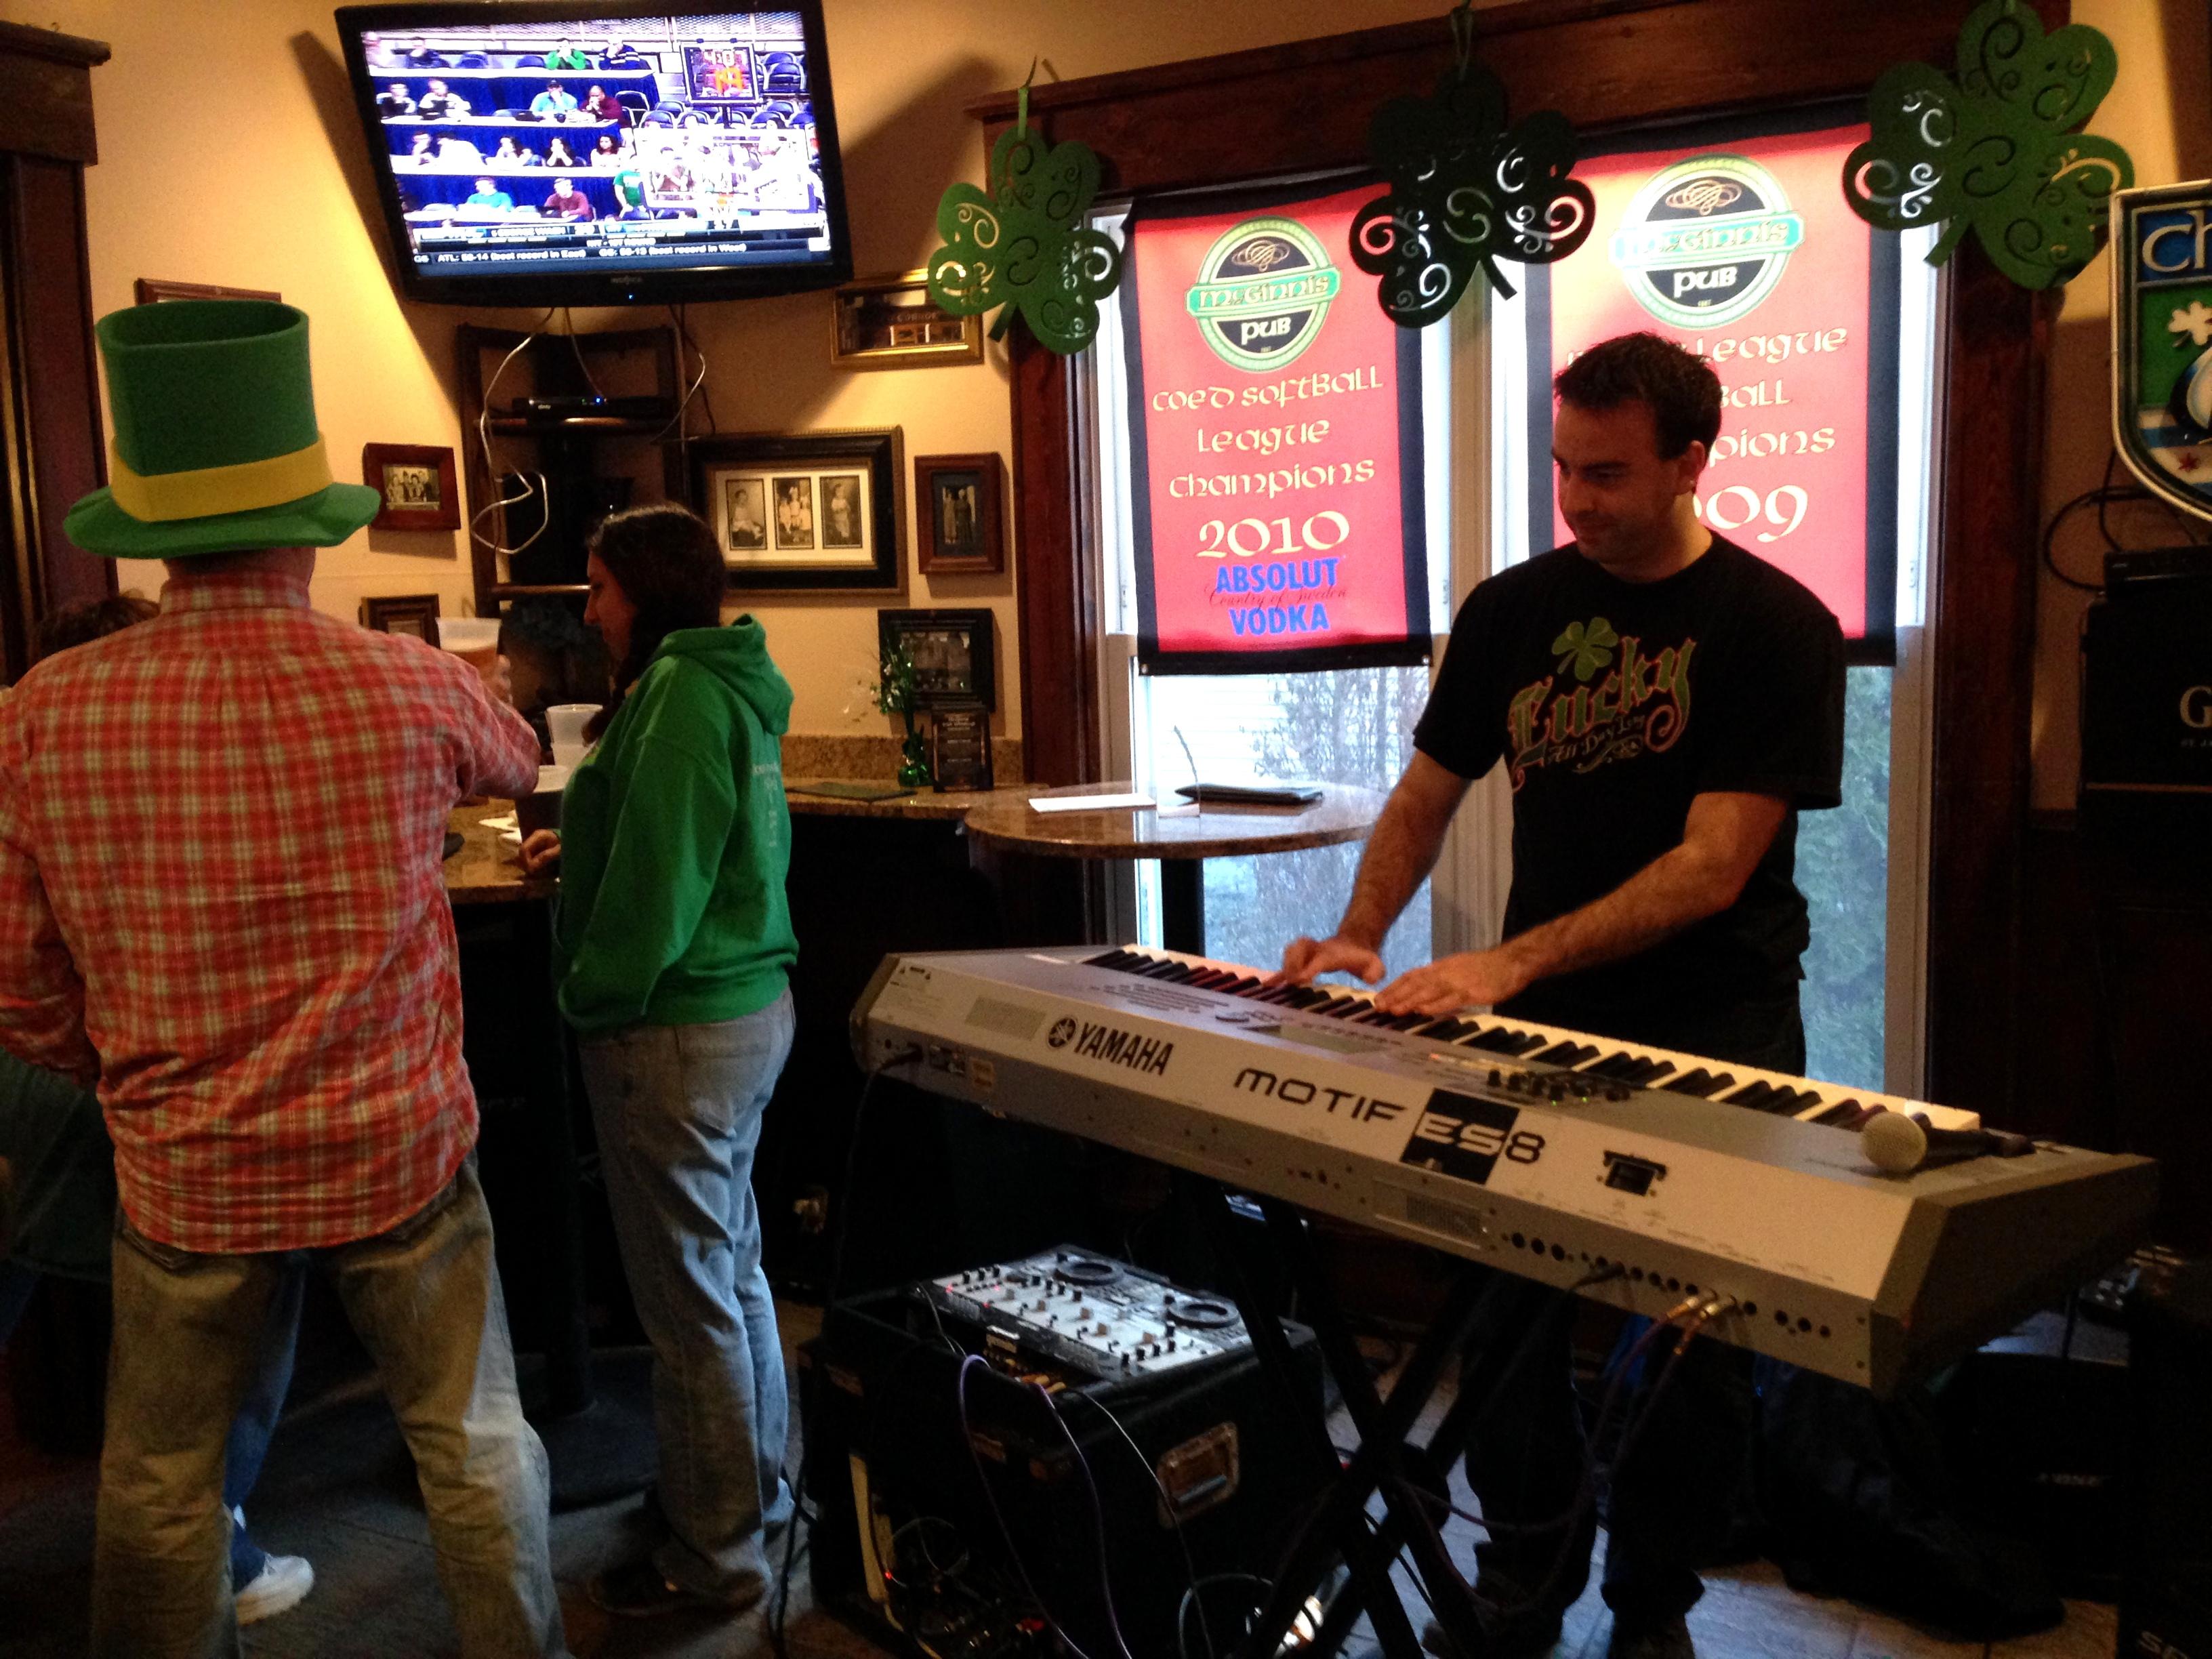 St. Patrick's Celebration at McGinnis pub.